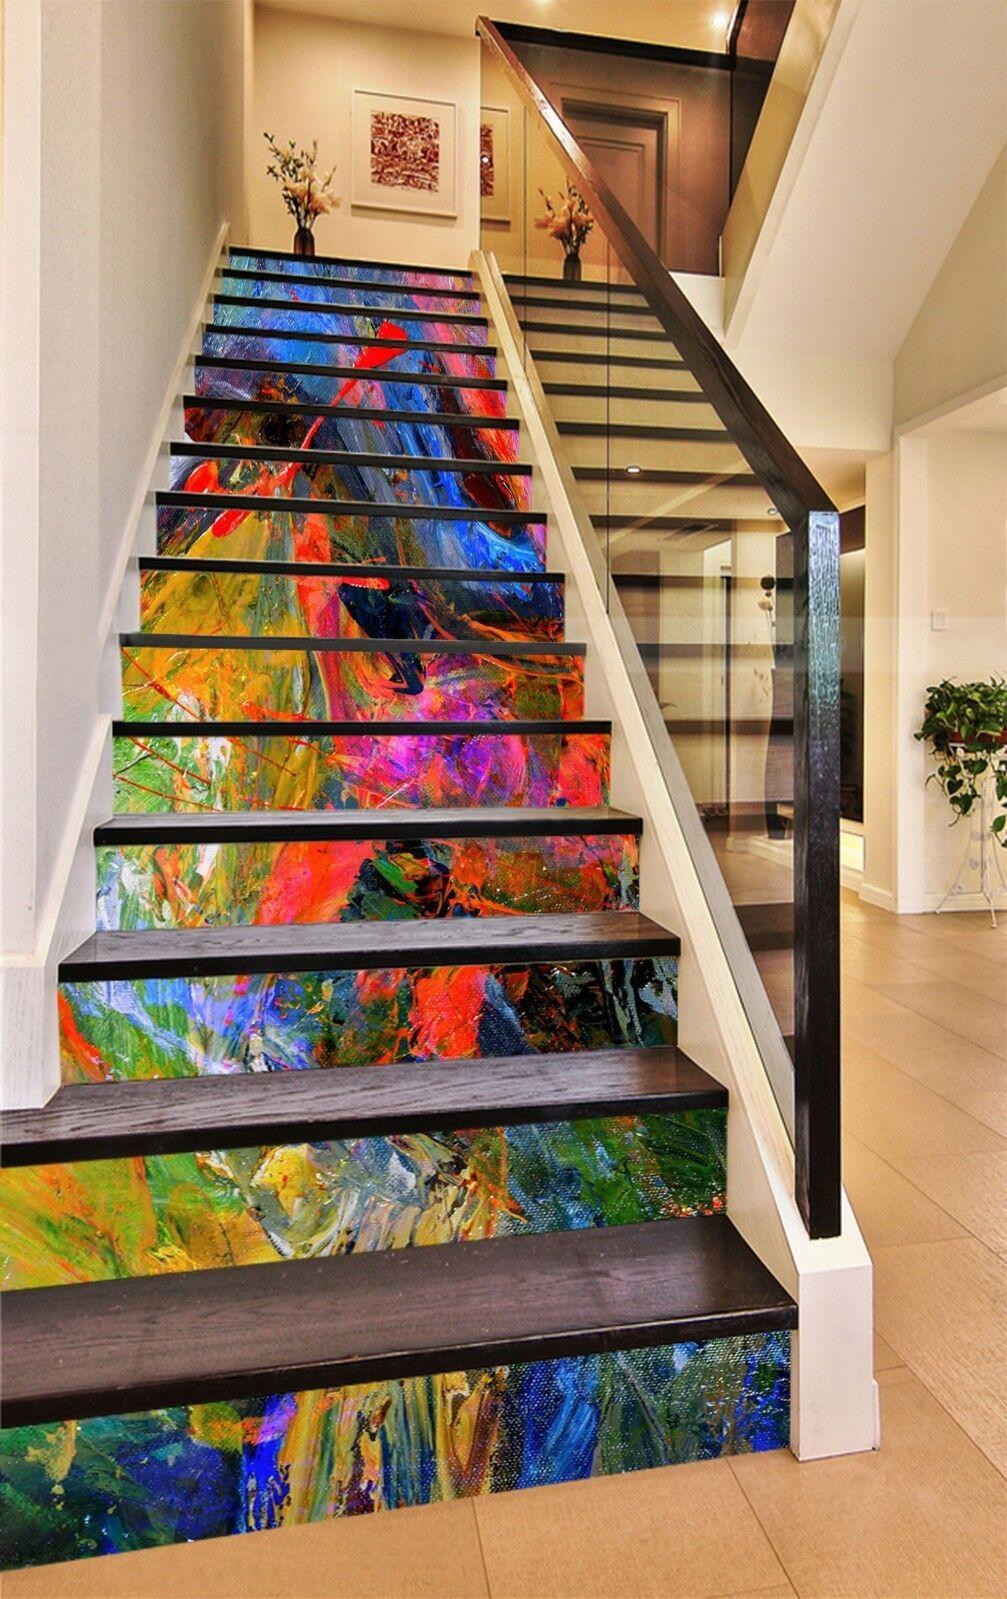 3D Farbeful 2 Stair Risers Decoration Photo Mural Vinyl Decal Wallpaper UK